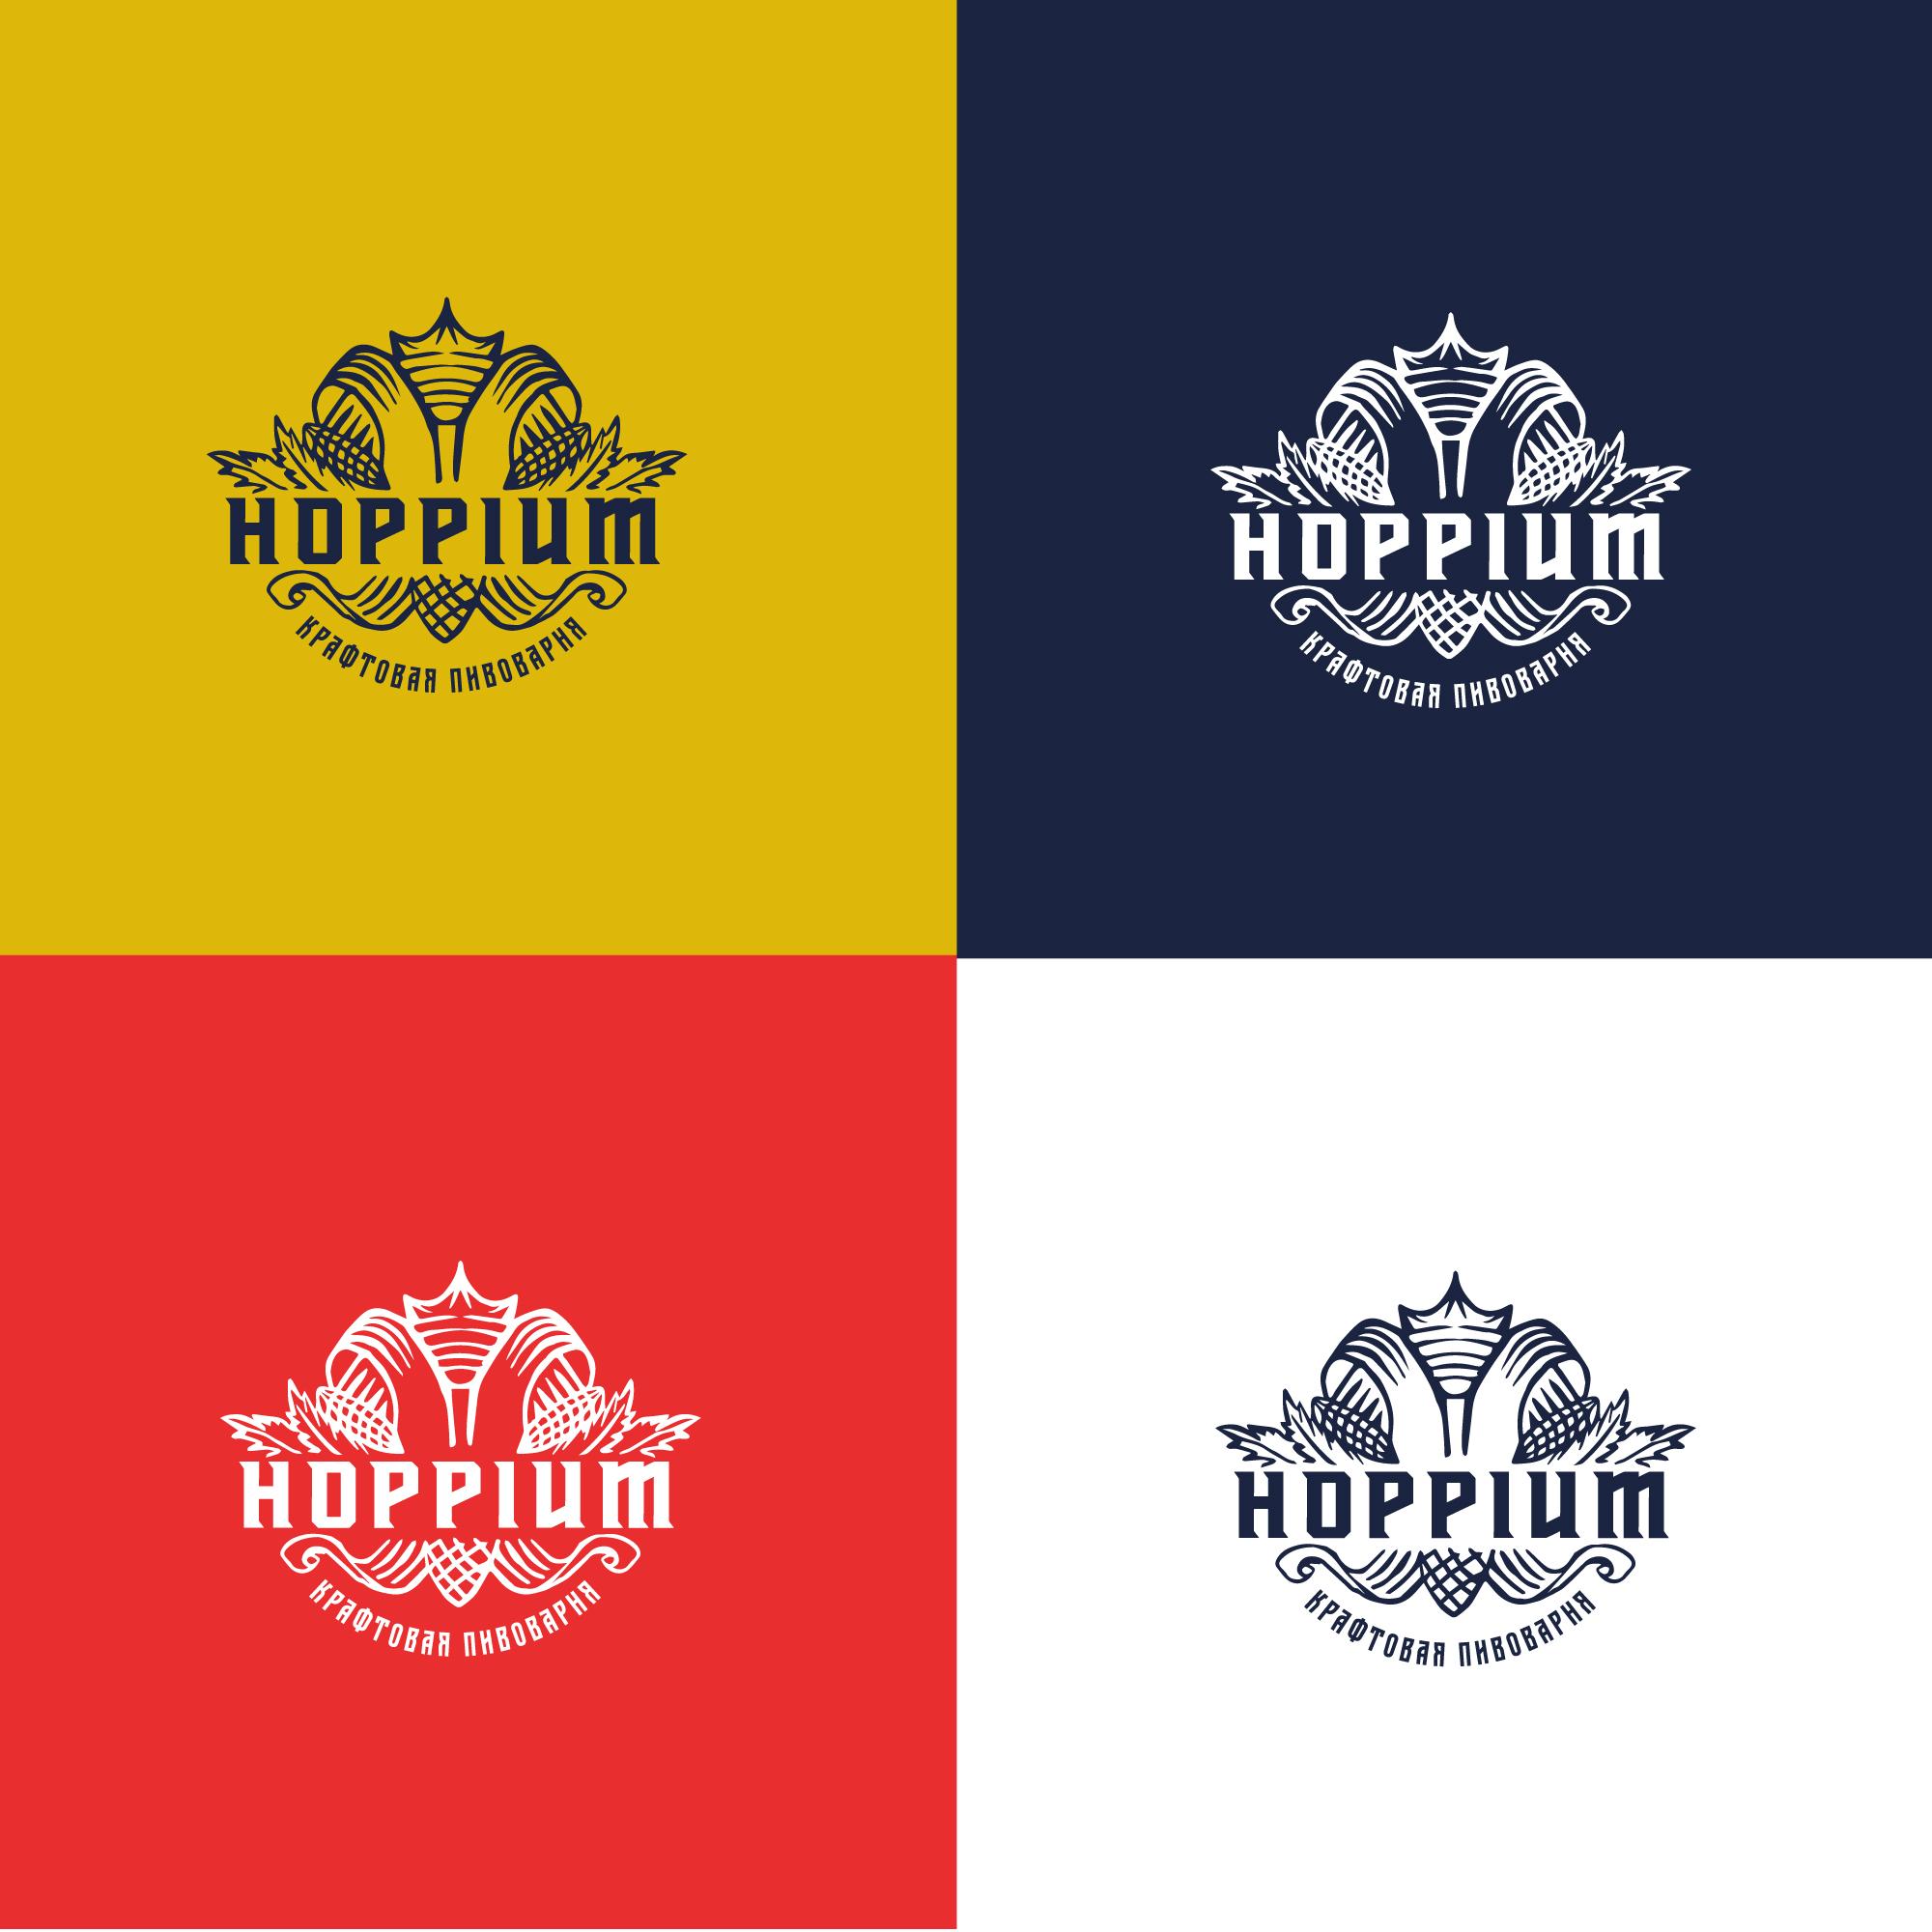 Логотип + Ценники для подмосковной крафтовой пивоварни фото f_2985dc2ddd453bf5.jpg